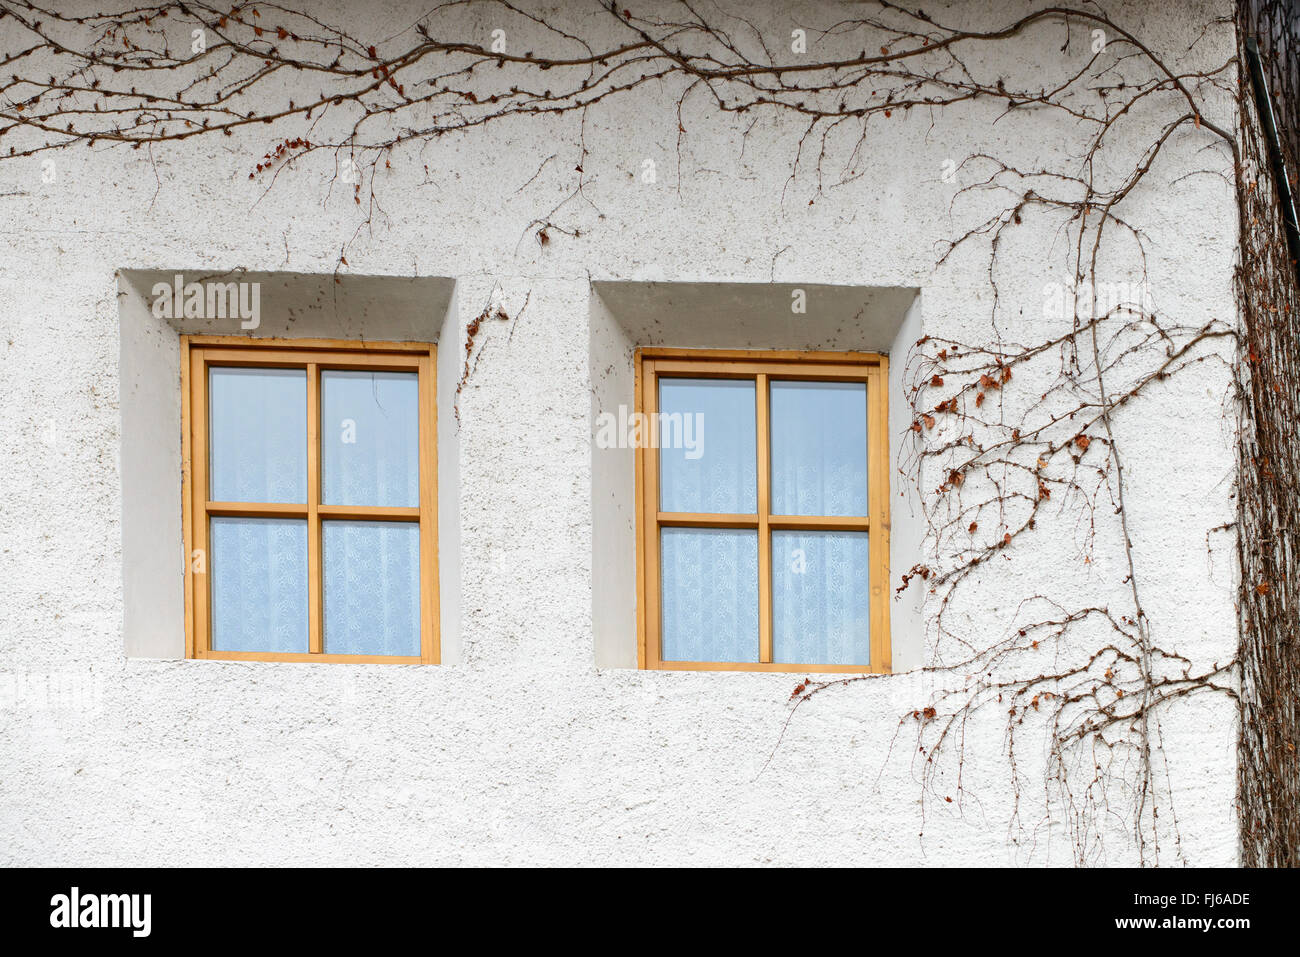 Hausmauer   house wall - Stock Image